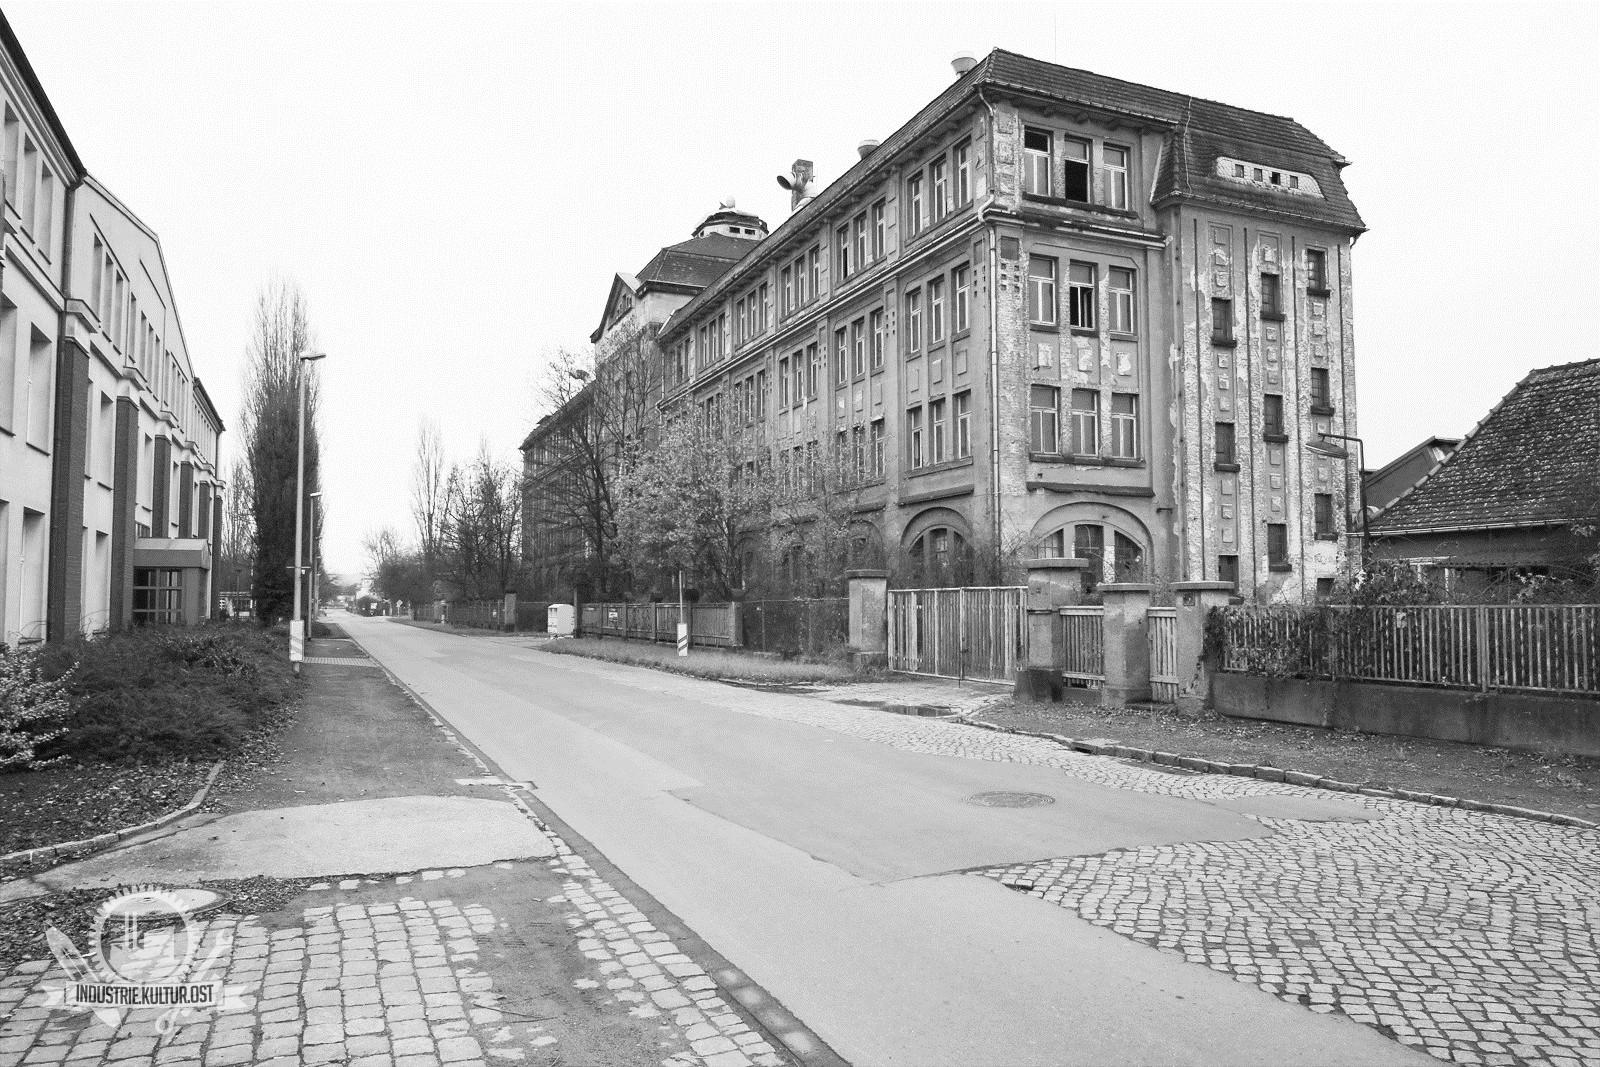 Lederfabrik Bierling Coswig / Baujahr 1906